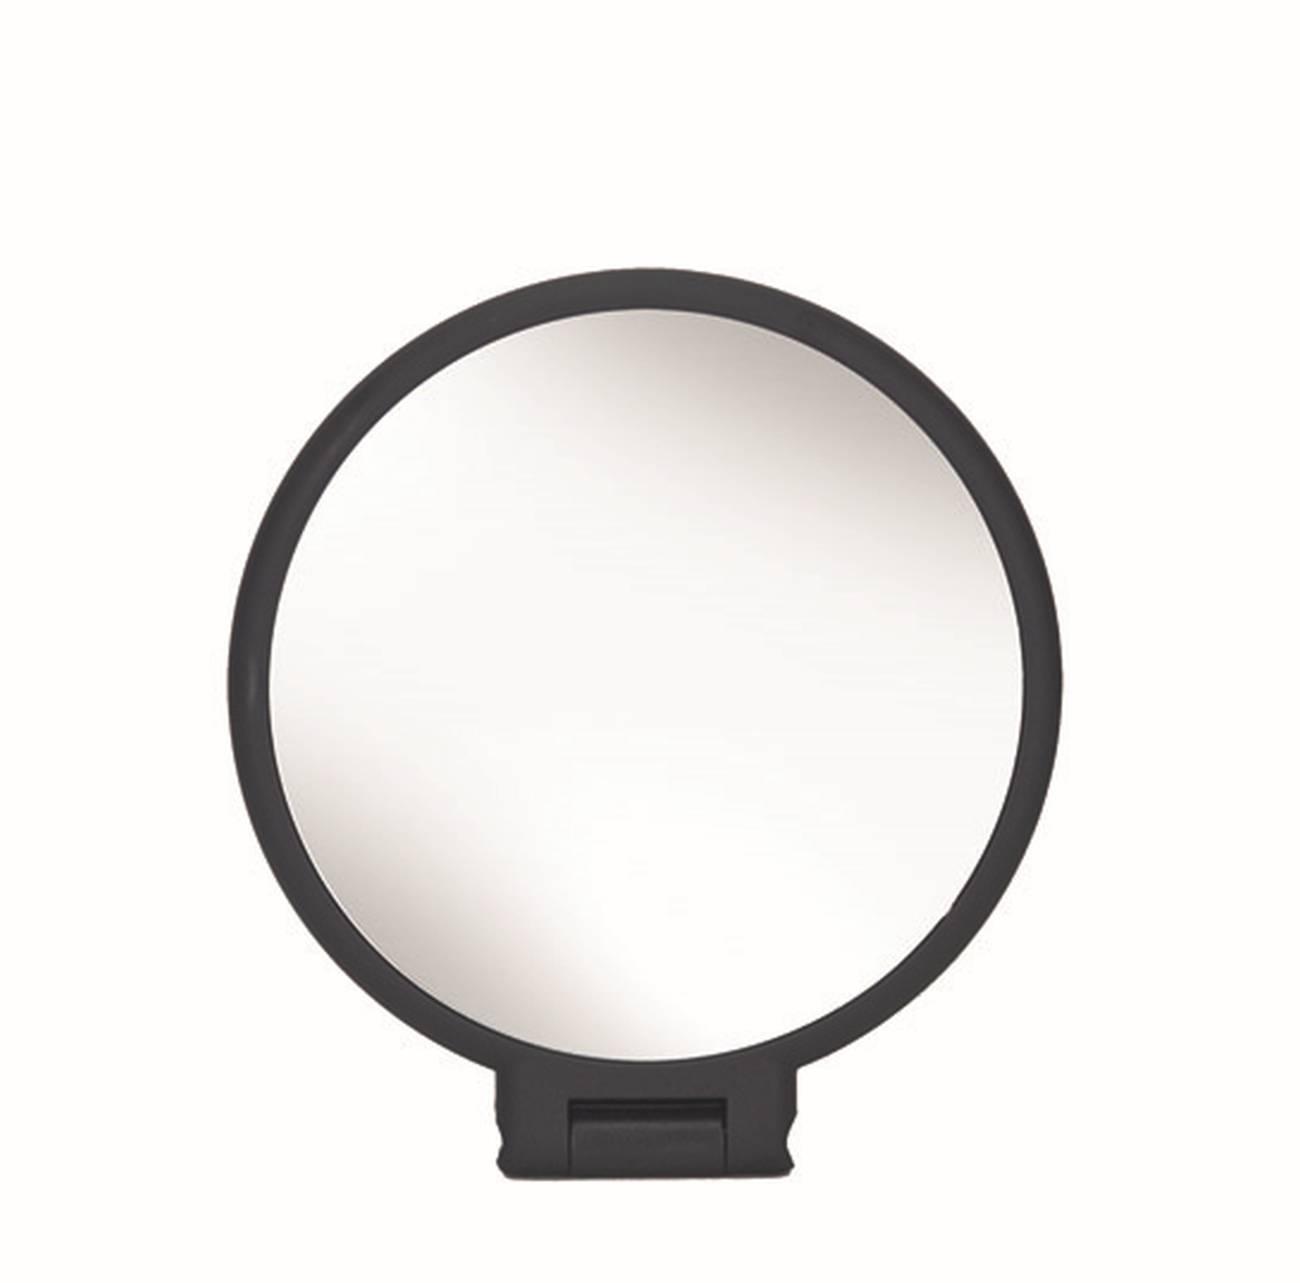 Kosmetikspiegel Multi Mirror Polystyrol/Glas Schwarz Spiegel